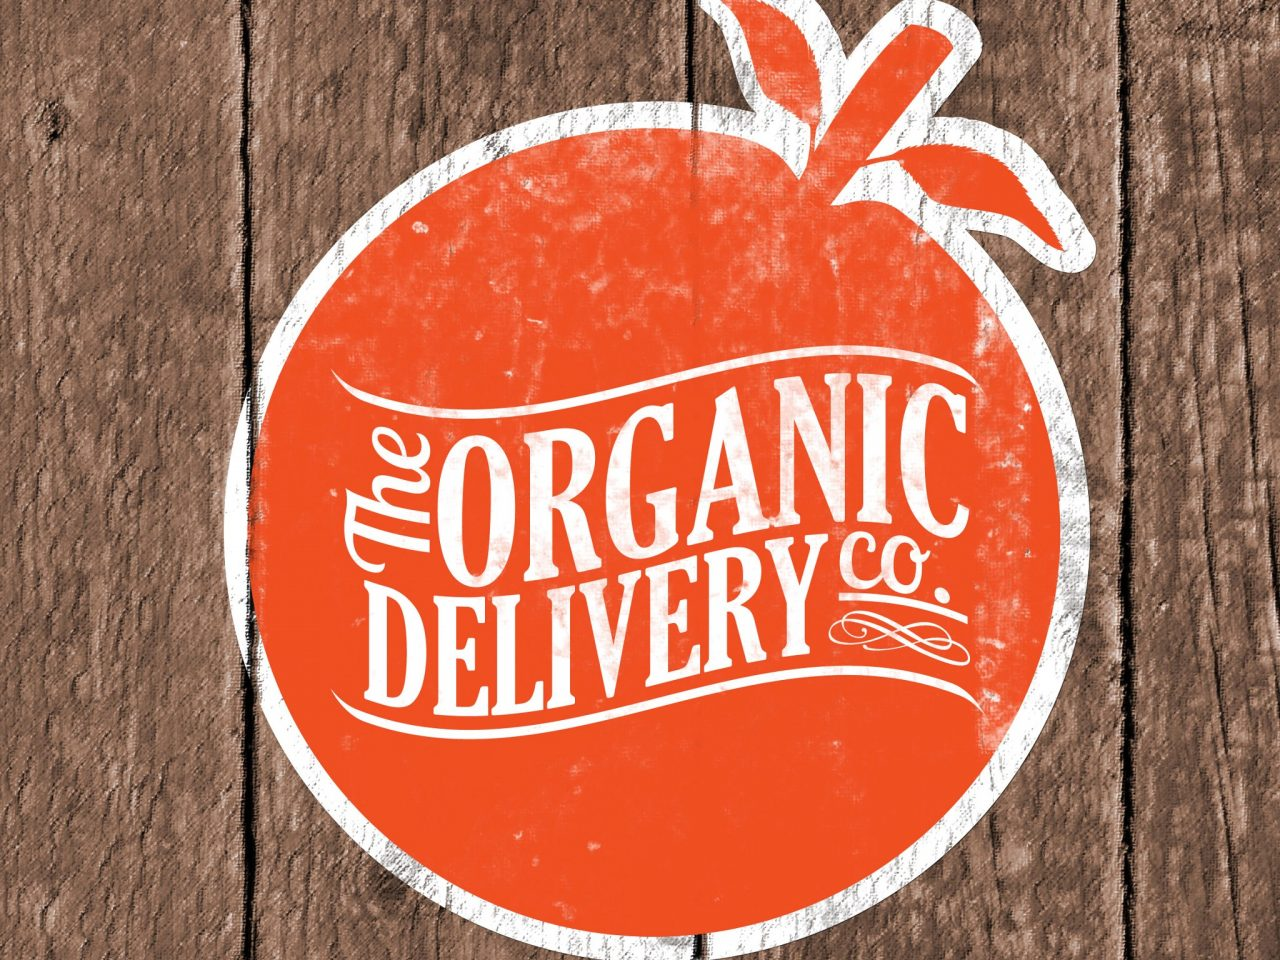 Organic delivery company logo